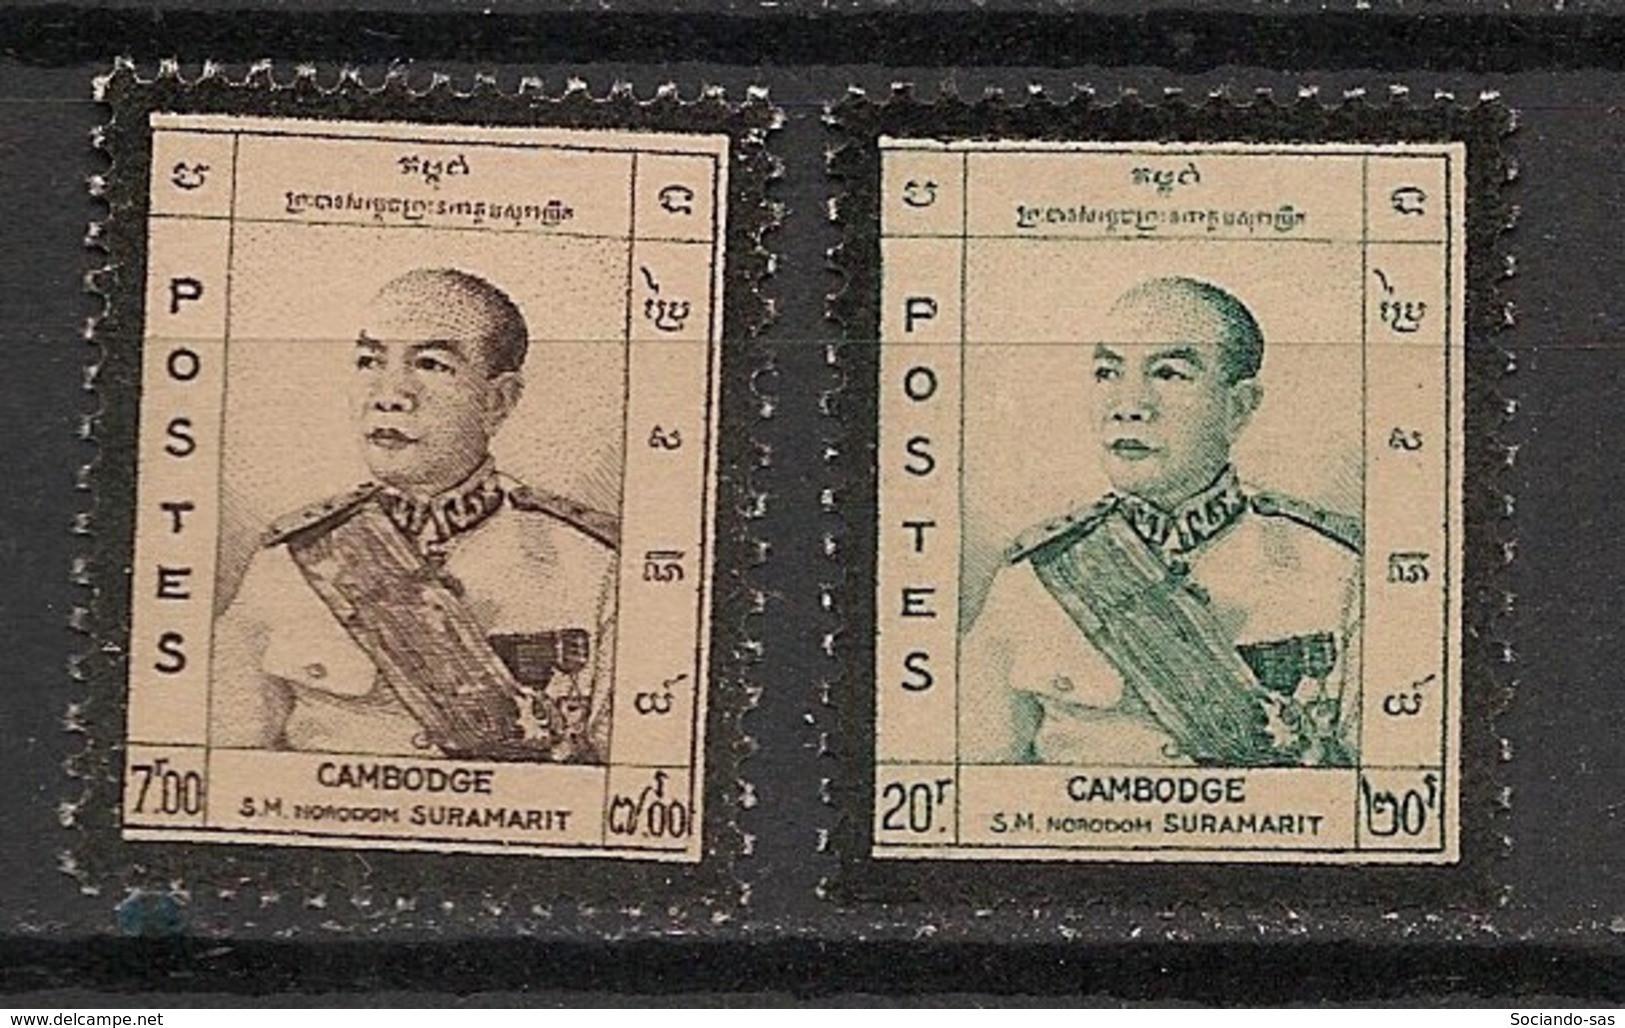 Cambodge - 1960 - N°Yv. 87 à 88 - Norodom Suramarit - Neuf Luxe ** / MNH / Postfrisch - Cambodia